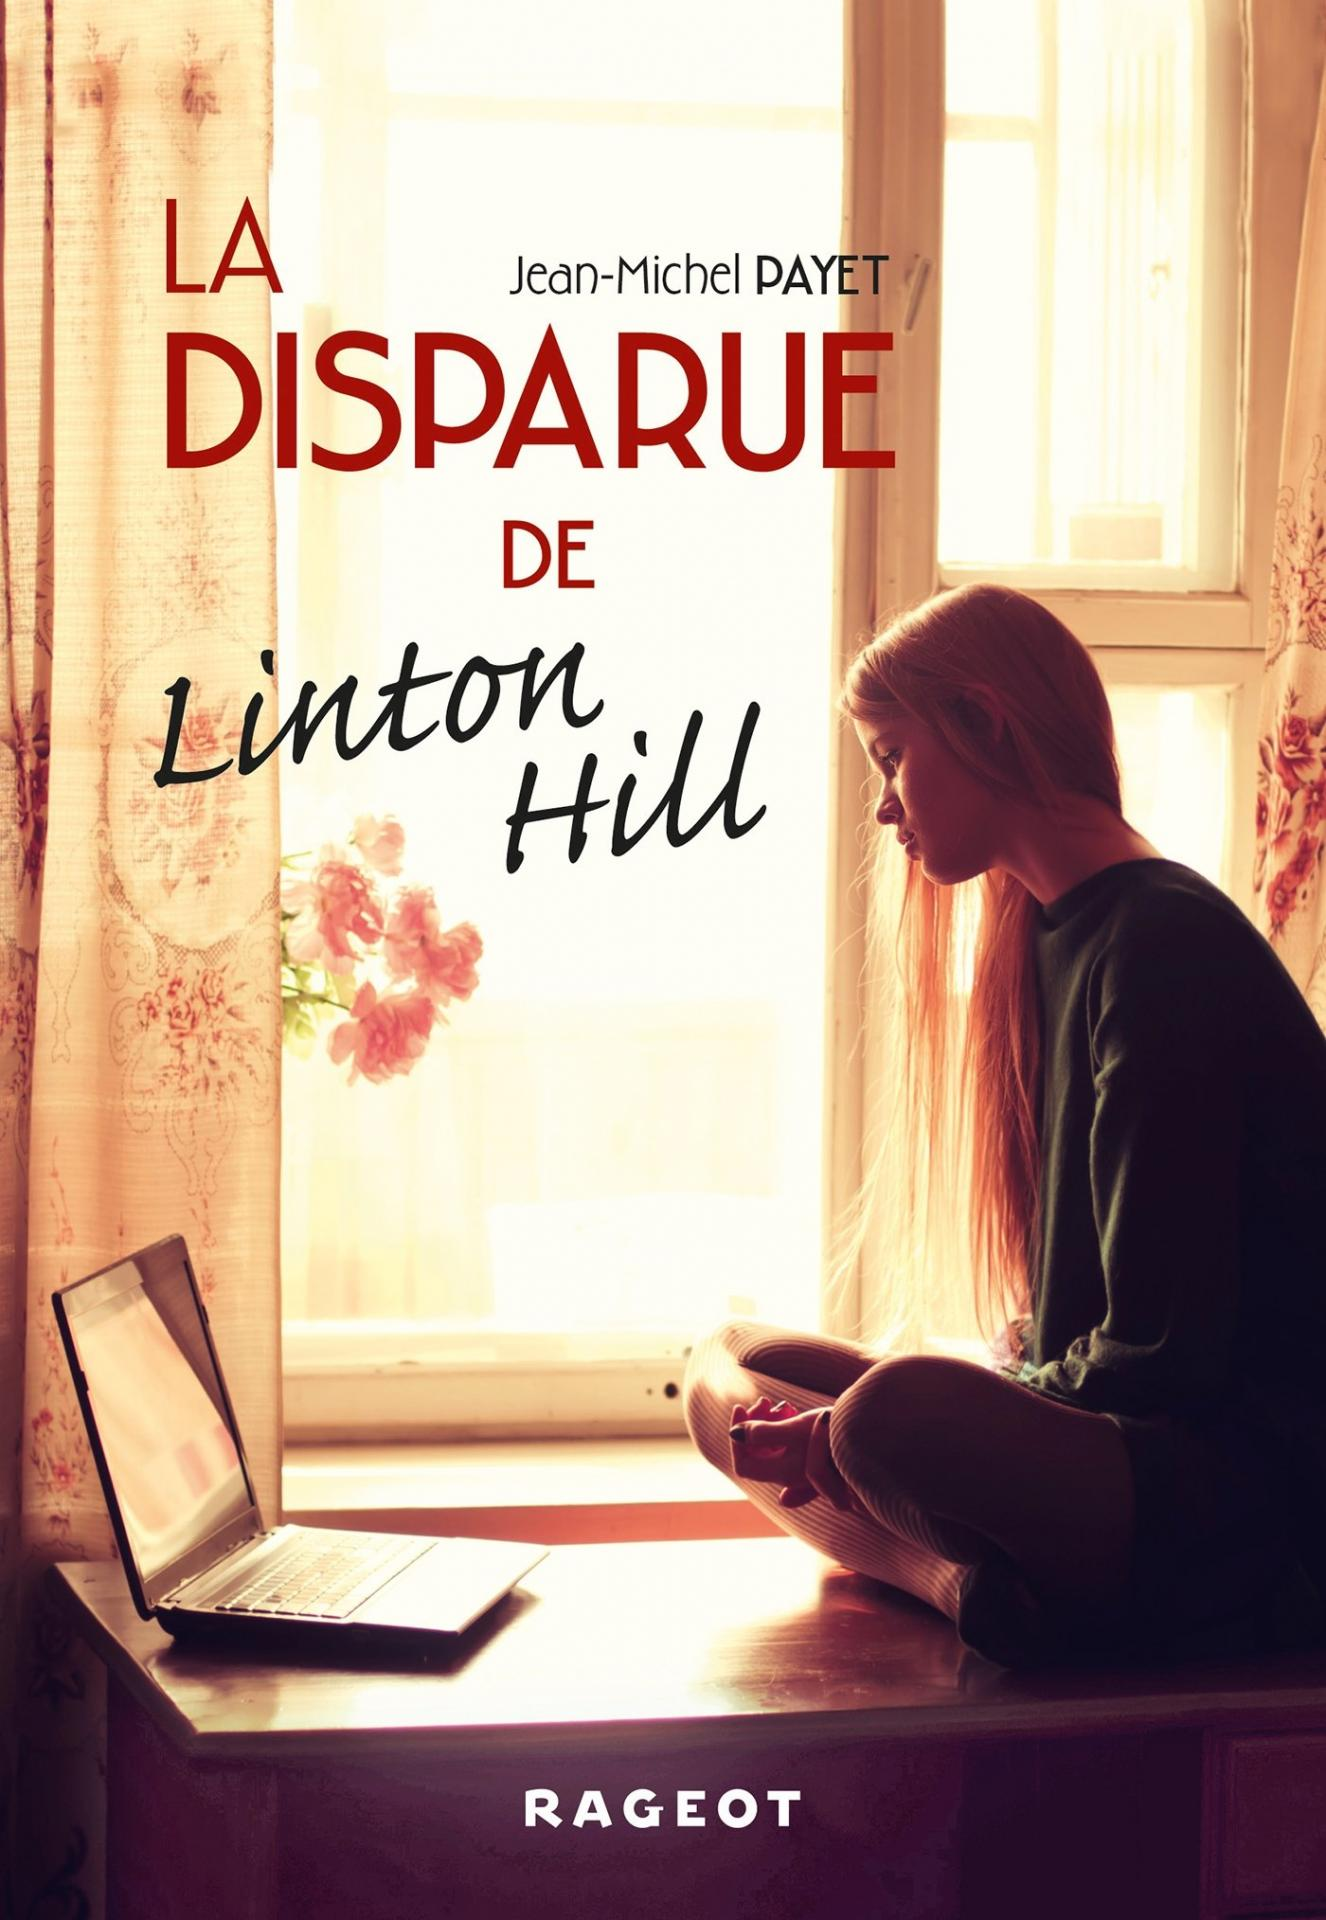 Linton hill